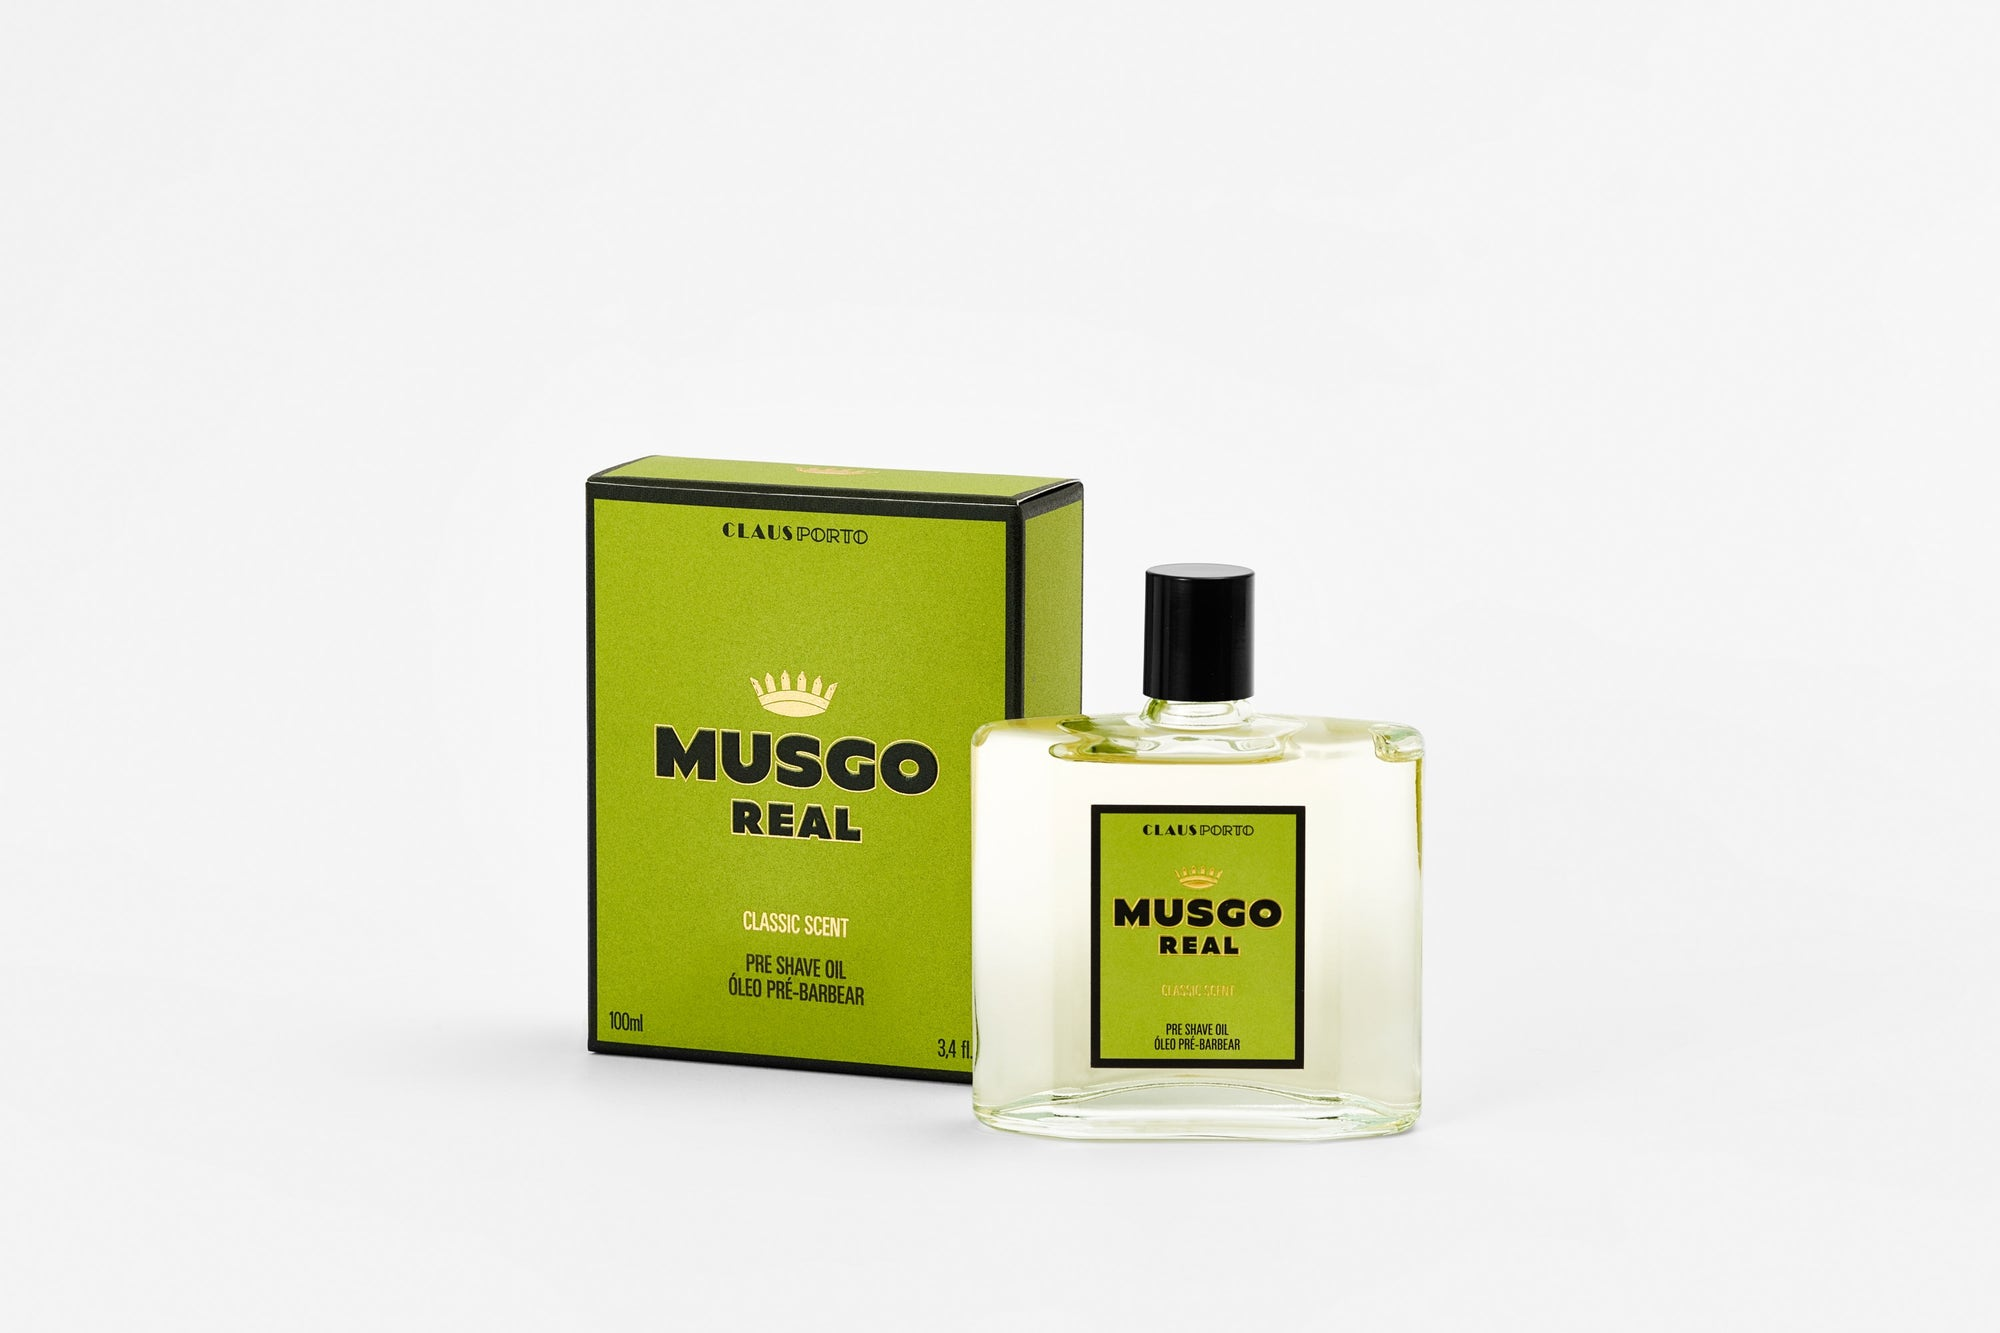 Musgo Real Pre Shave Oil - Classic Scent 100ml